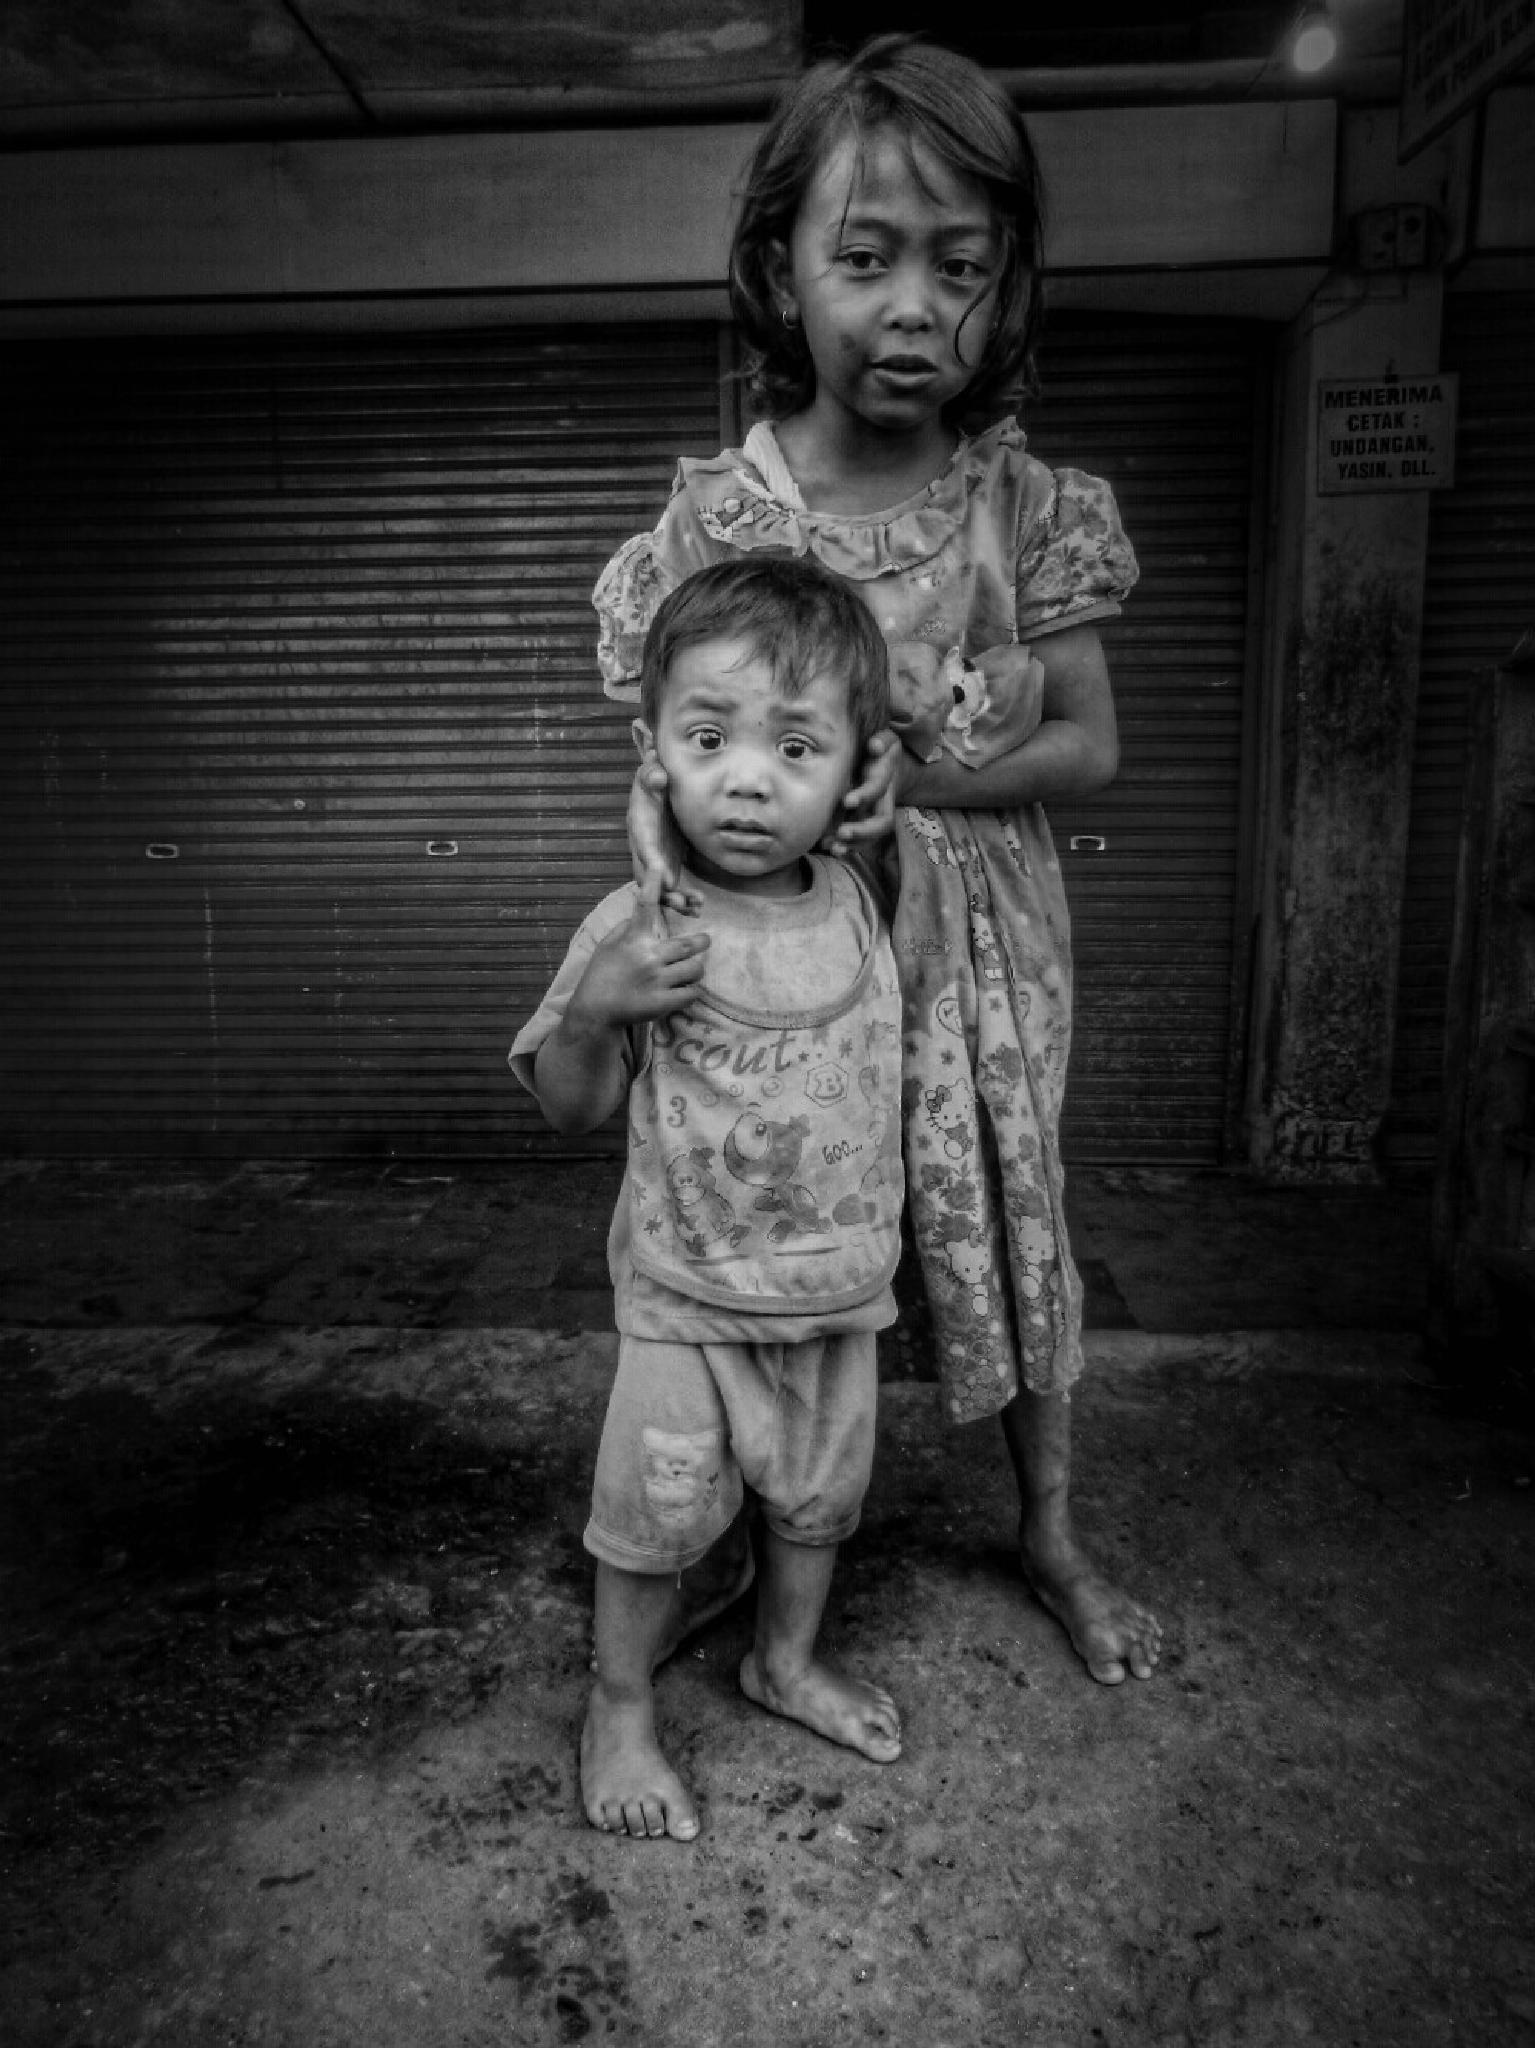 Untitled by suhartono